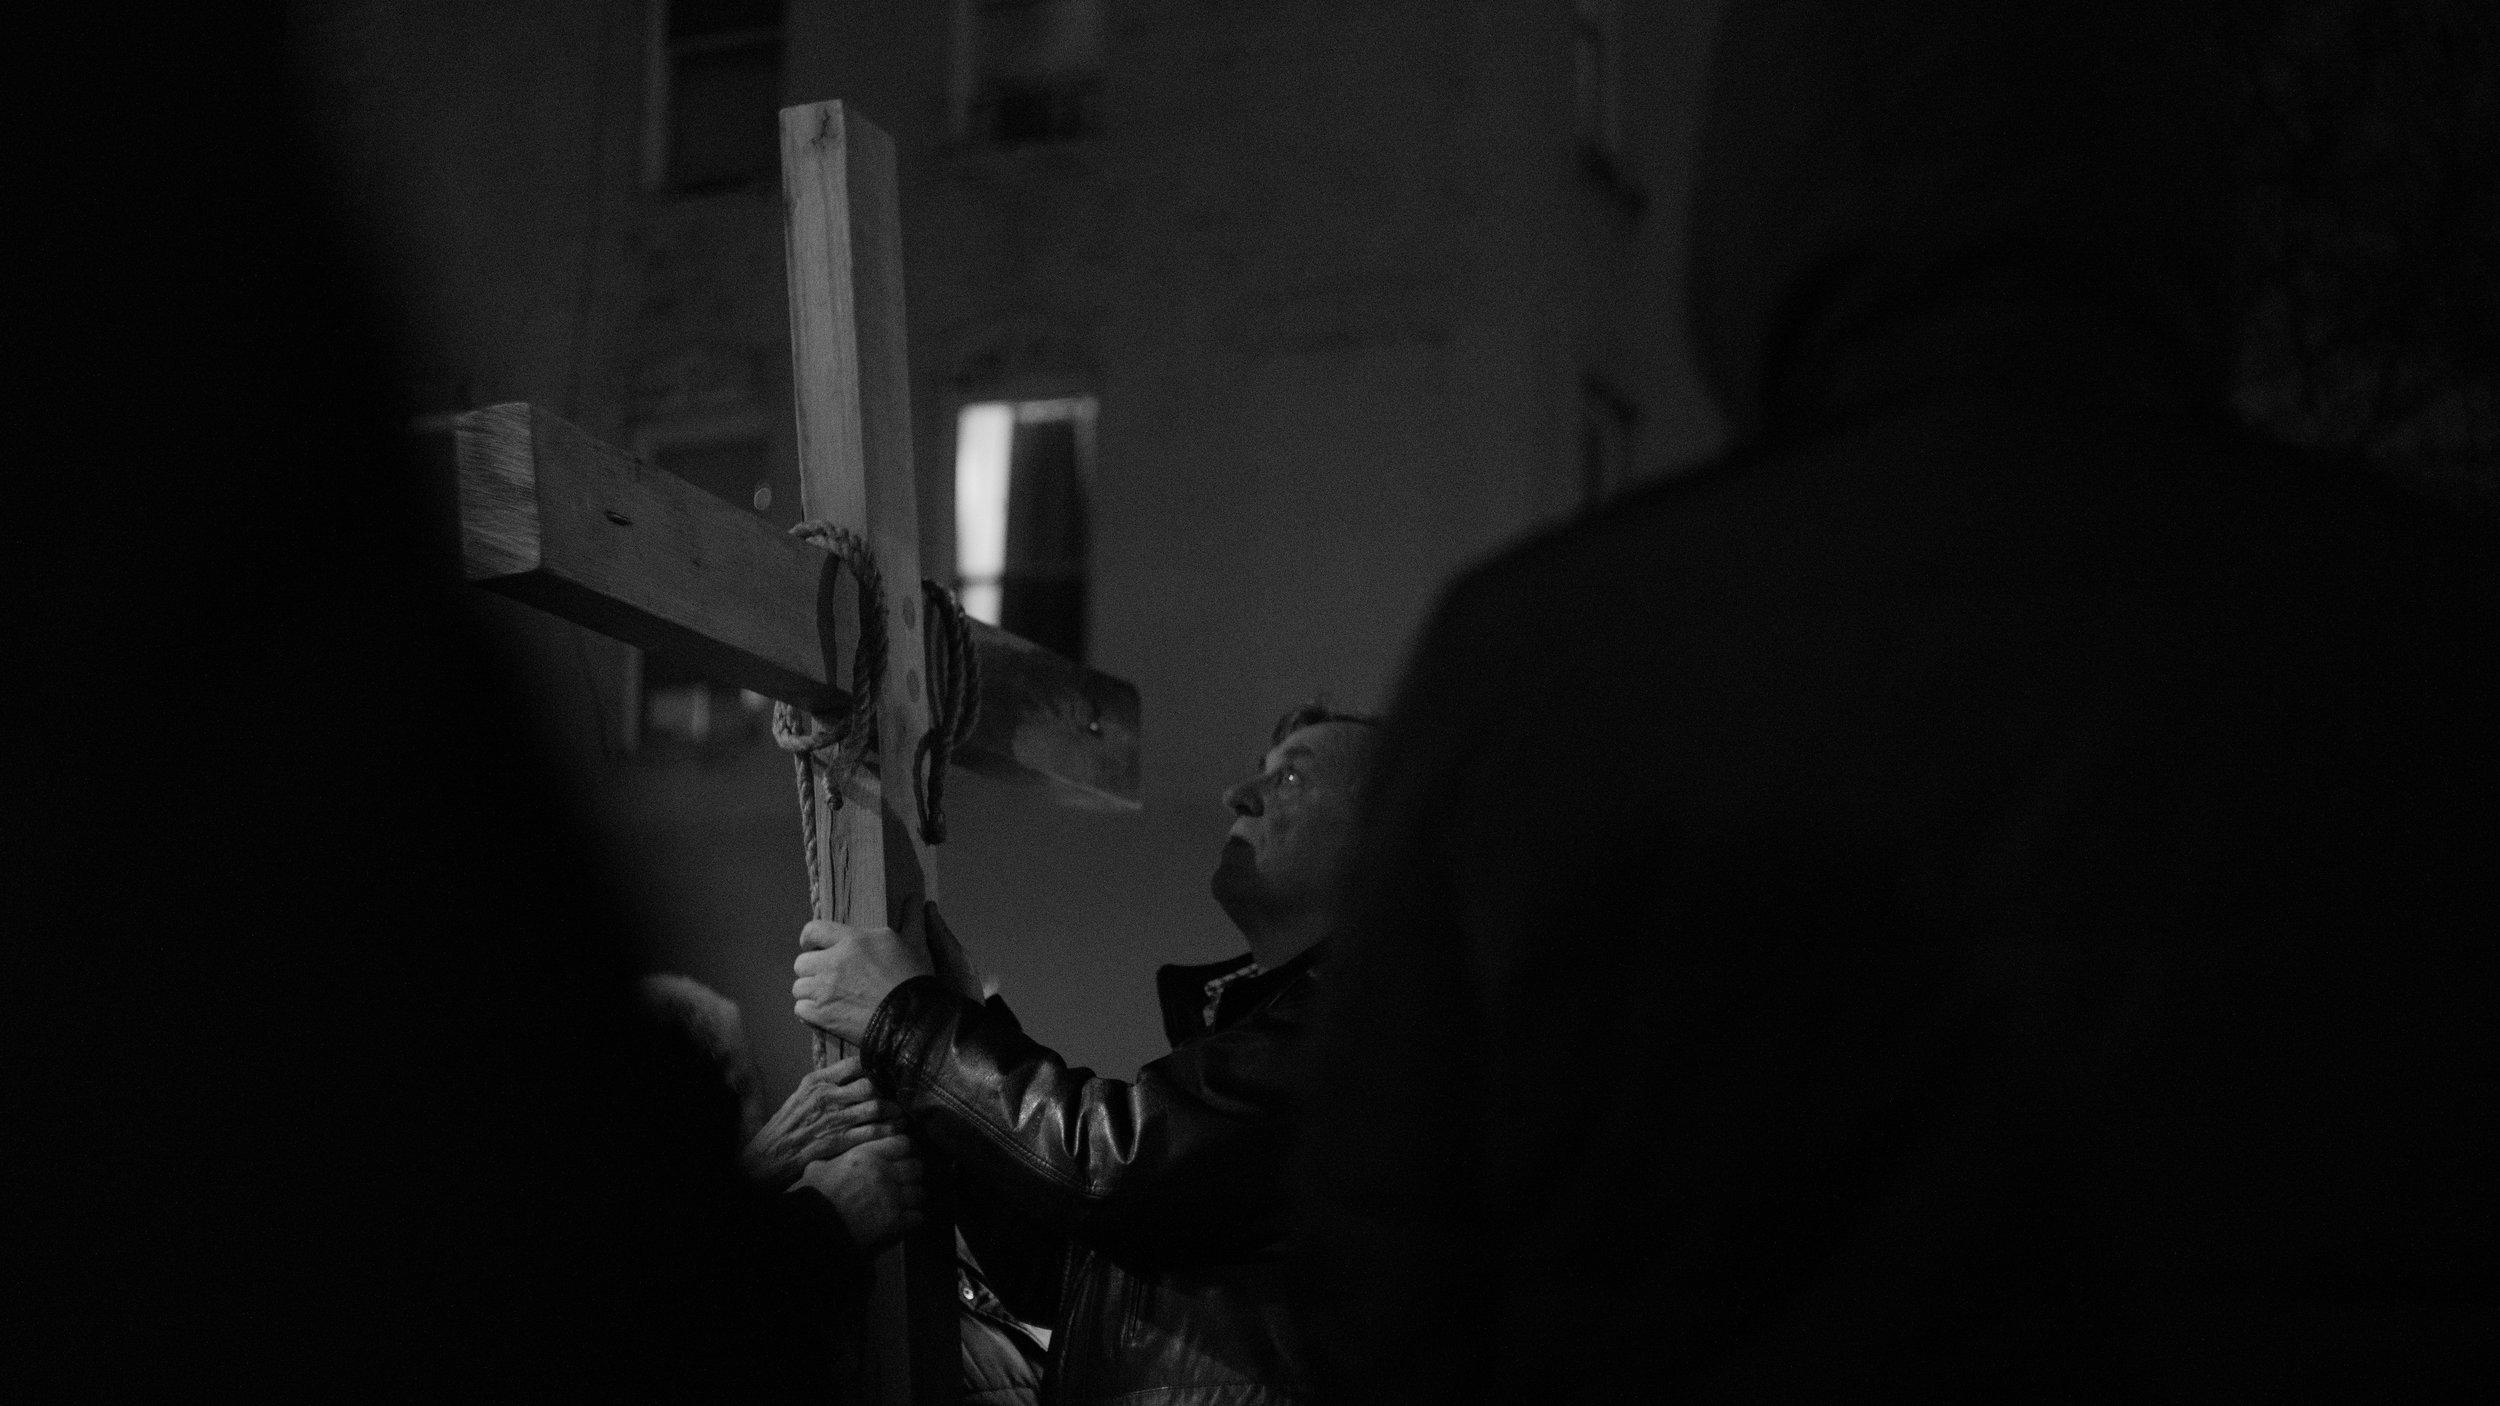 procession-man2.jpg